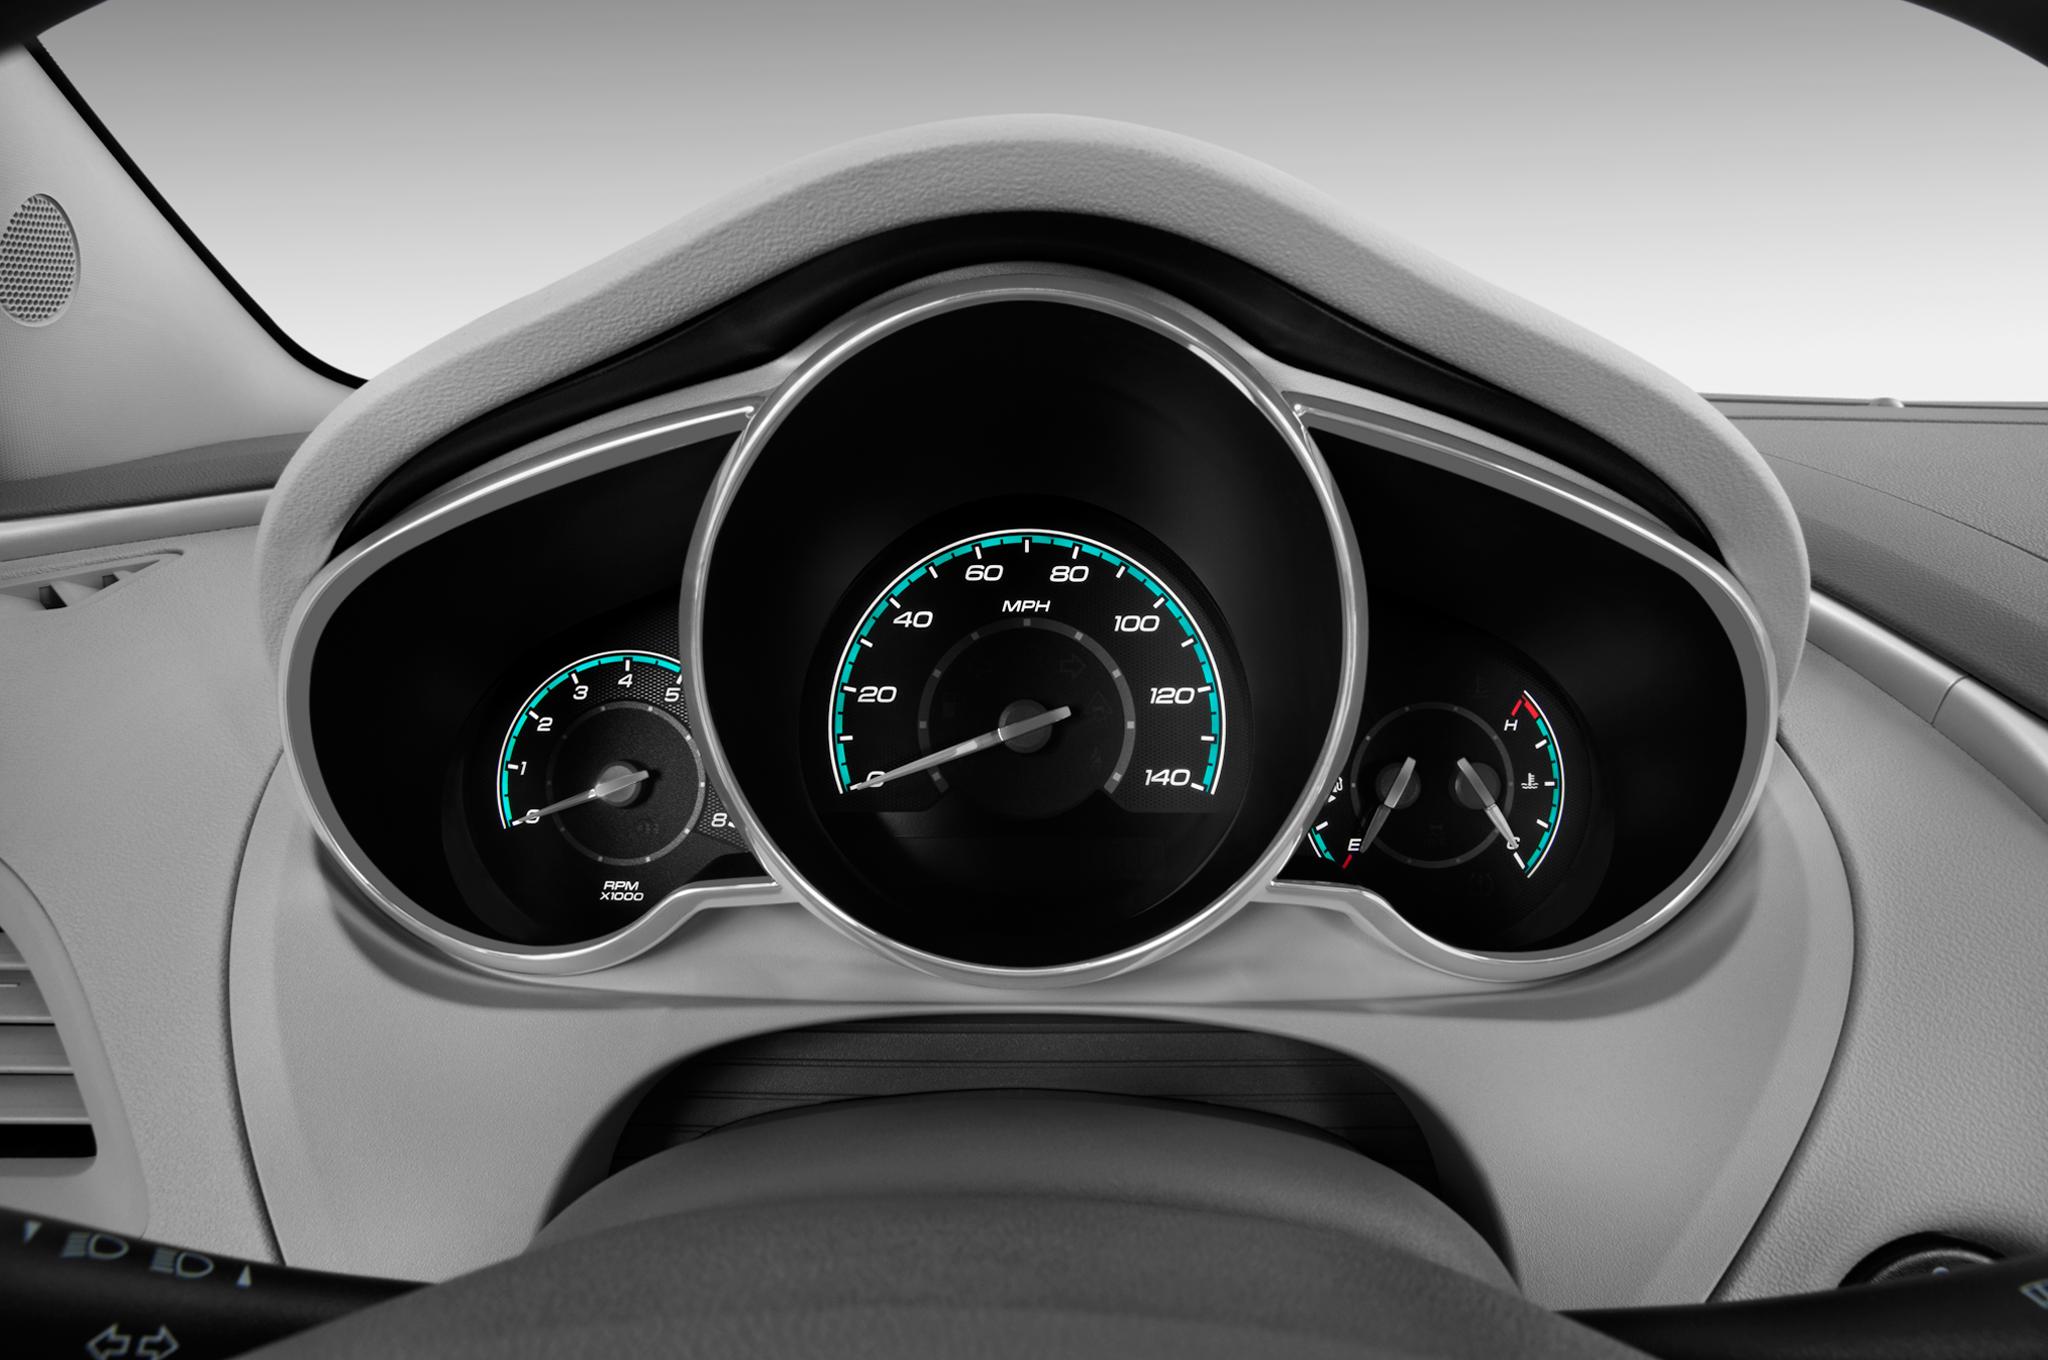 2018 Chevrolet Equinox Infotainment Manual | Upcomingcarshq.com